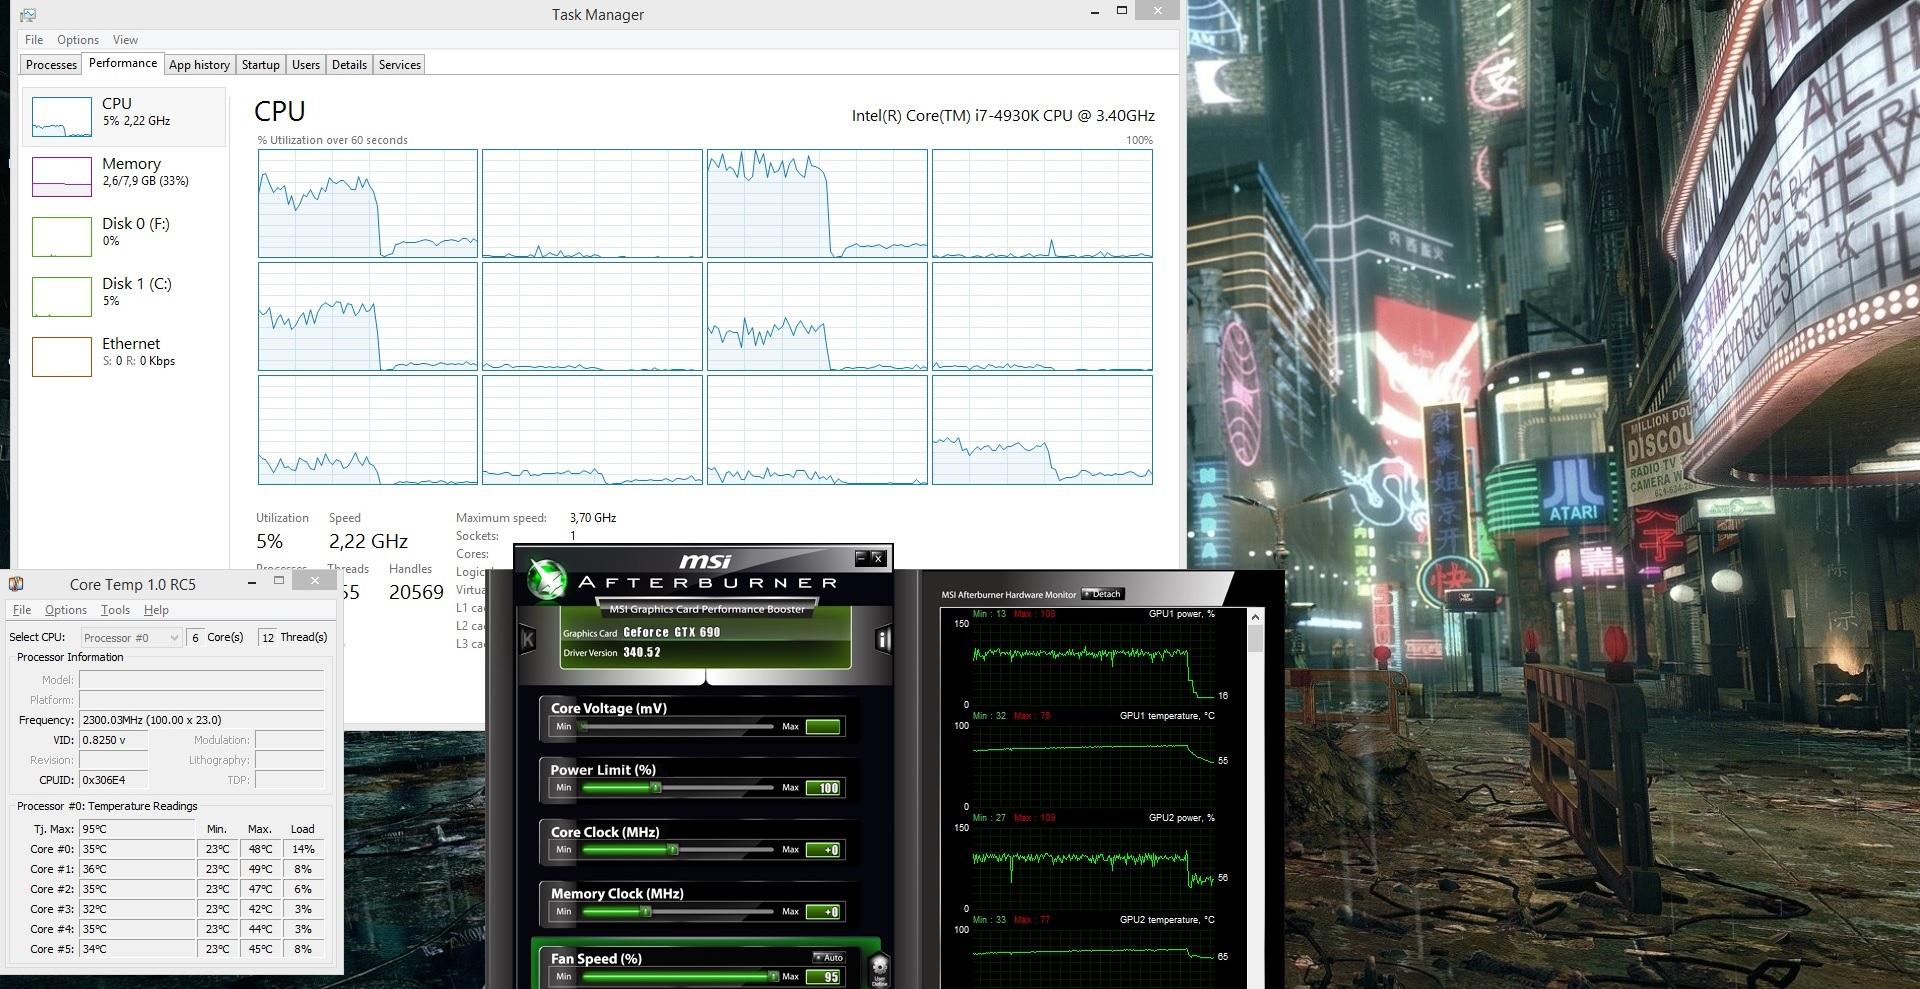 Lichdom: Battlemage - PC Performance Analysis - DSOGaming